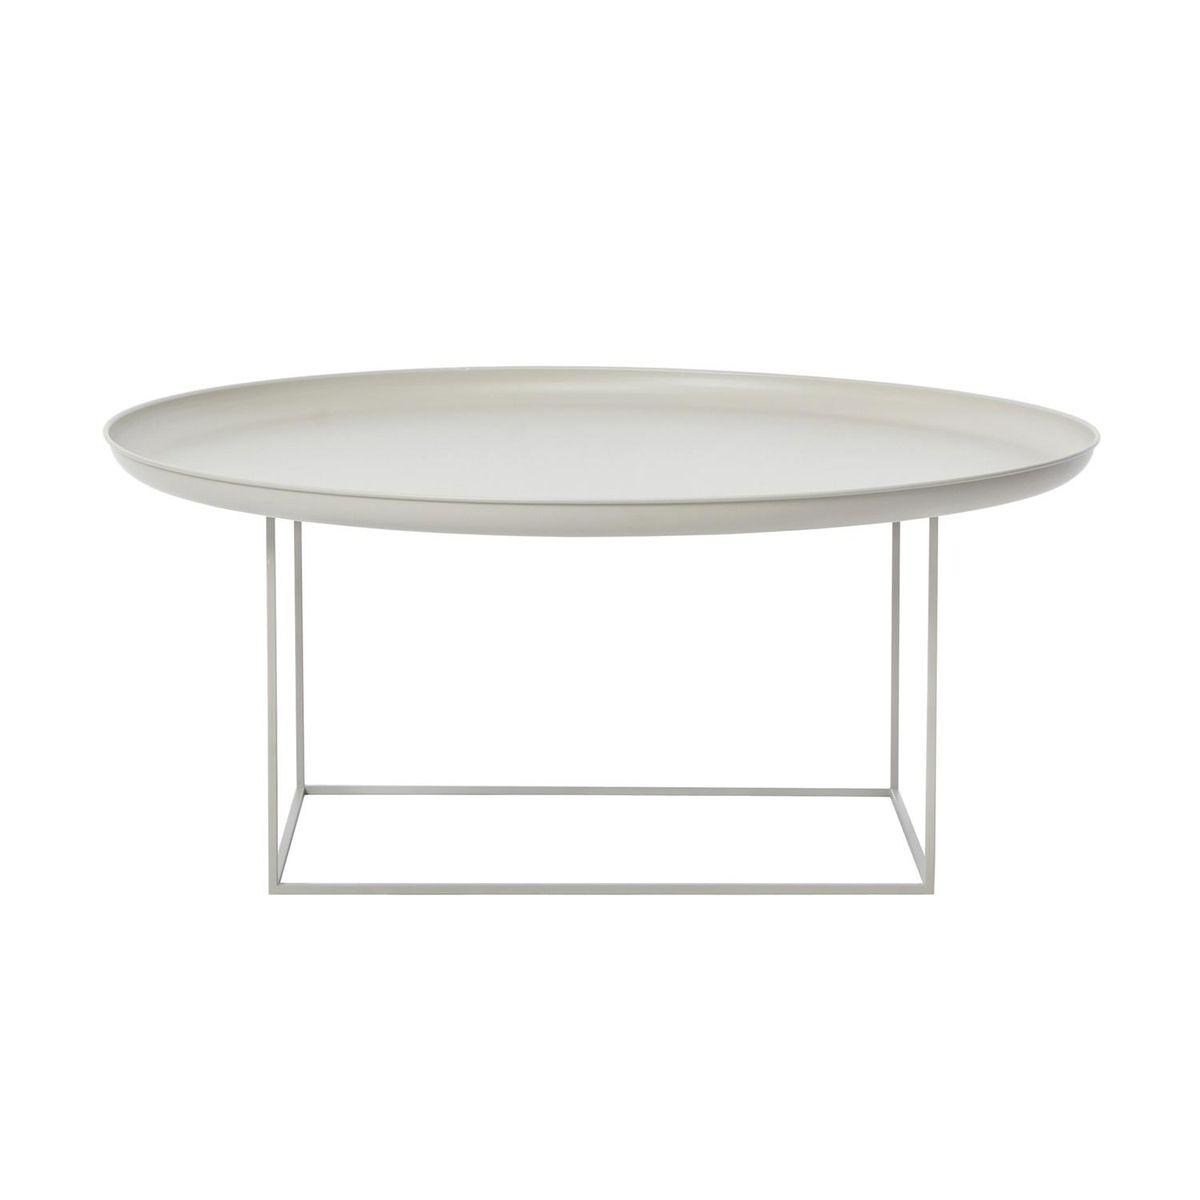 NORR 11   Duke Large Side Table Ø 90cm   Kahki Grey/removable Table Top